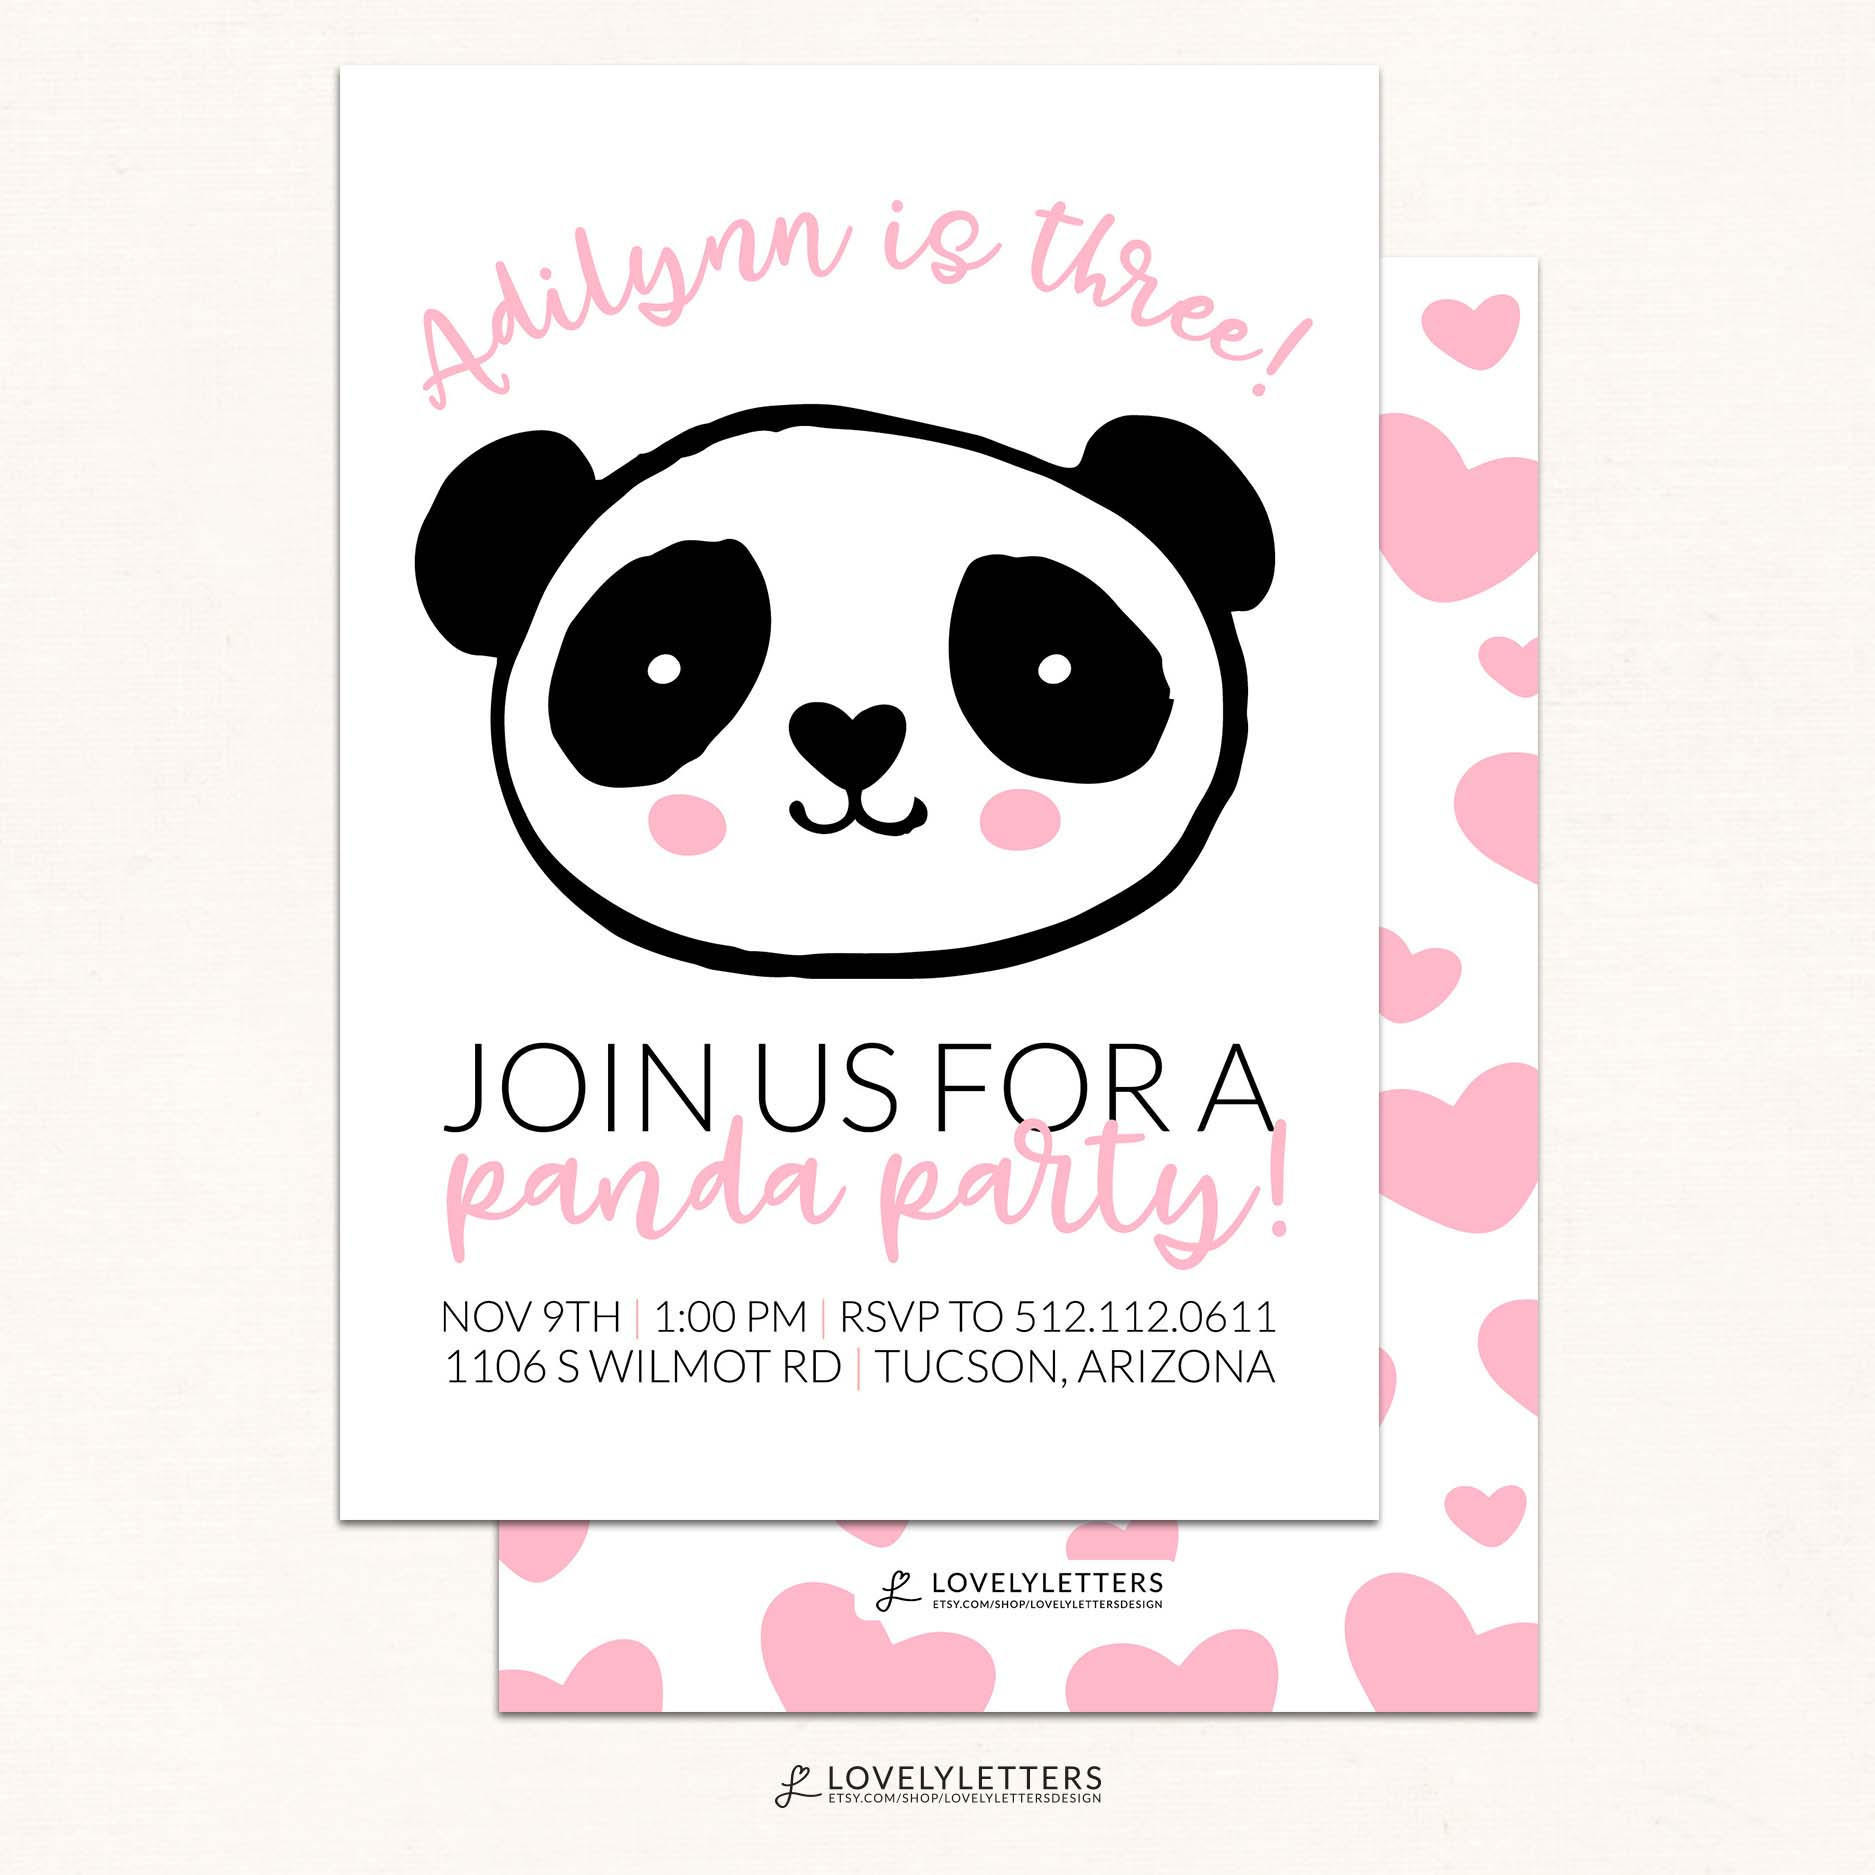 Panda Birthday Invitations  Panda Birthday Invitation DIGITAL Panda Party